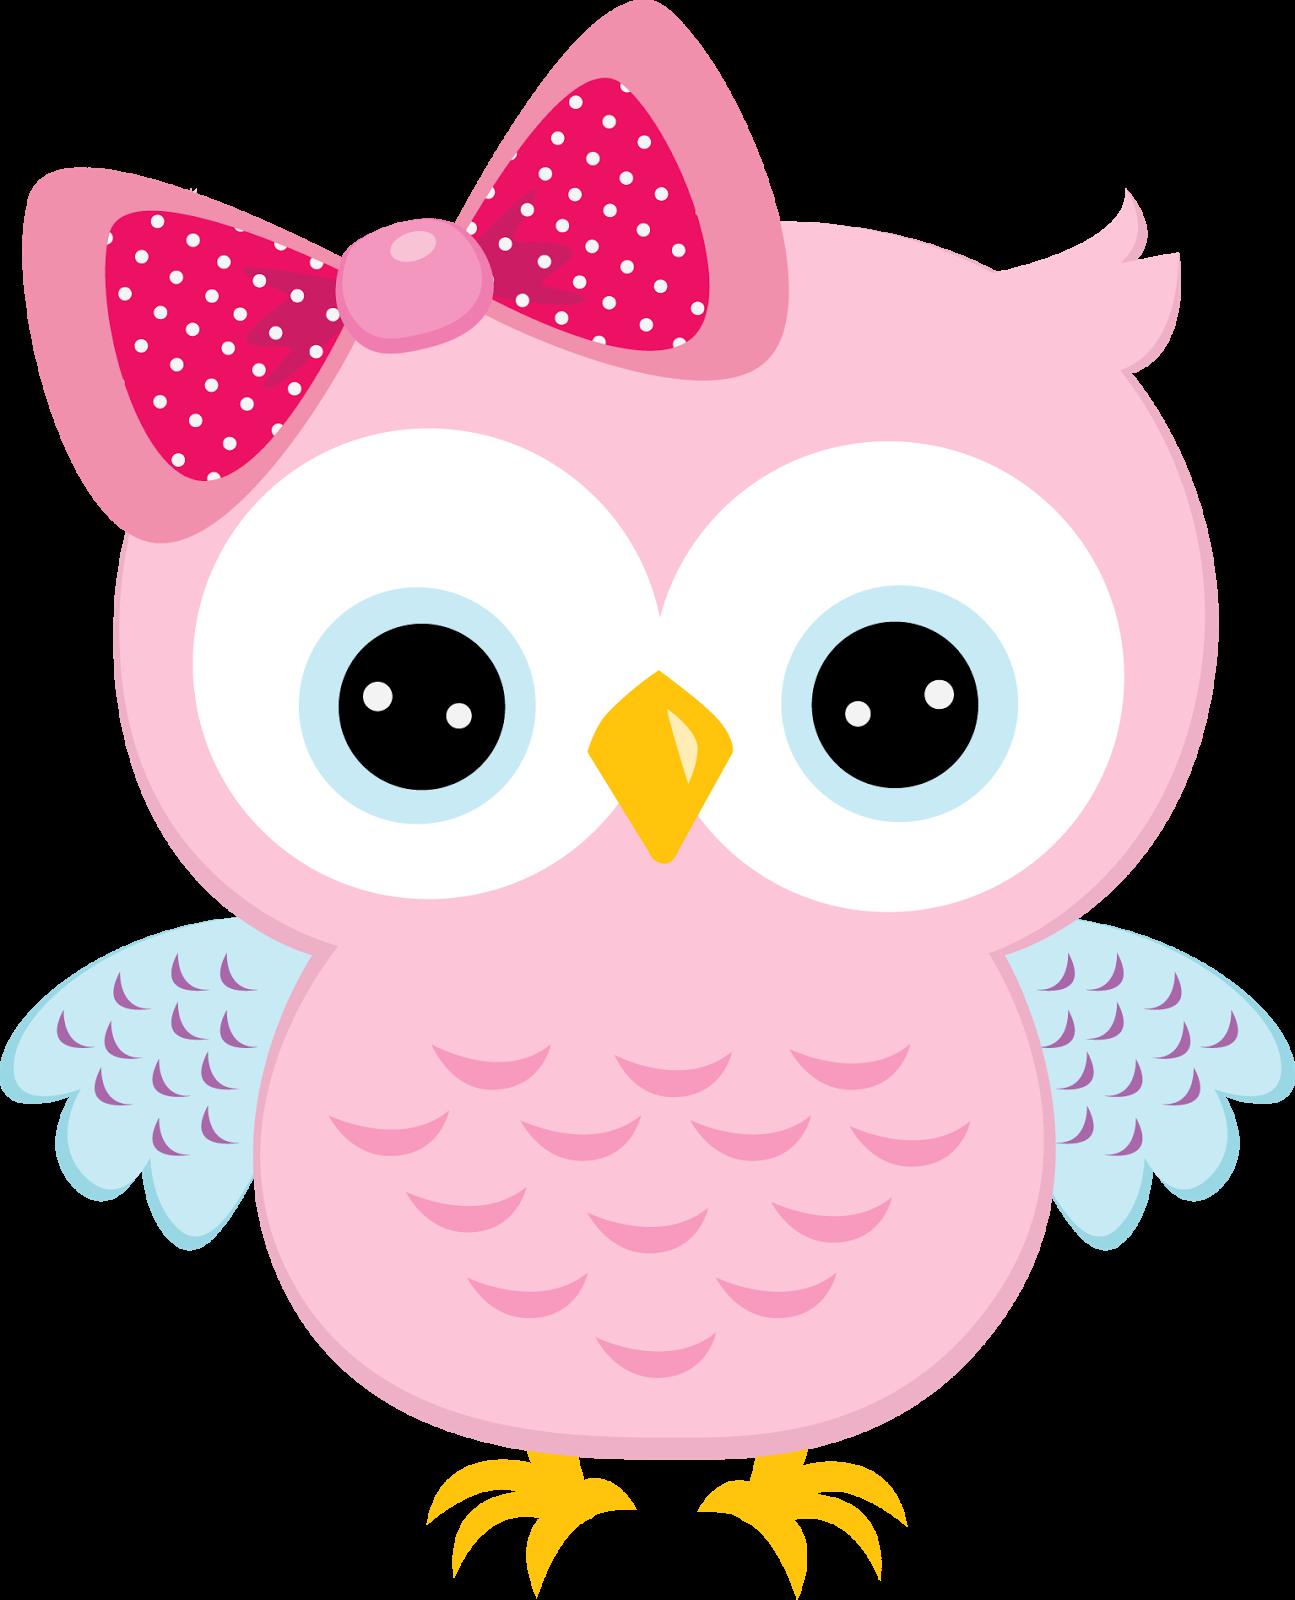 Heart clipart owl. Http gifsyfondospazenlatormenta blogspot pt